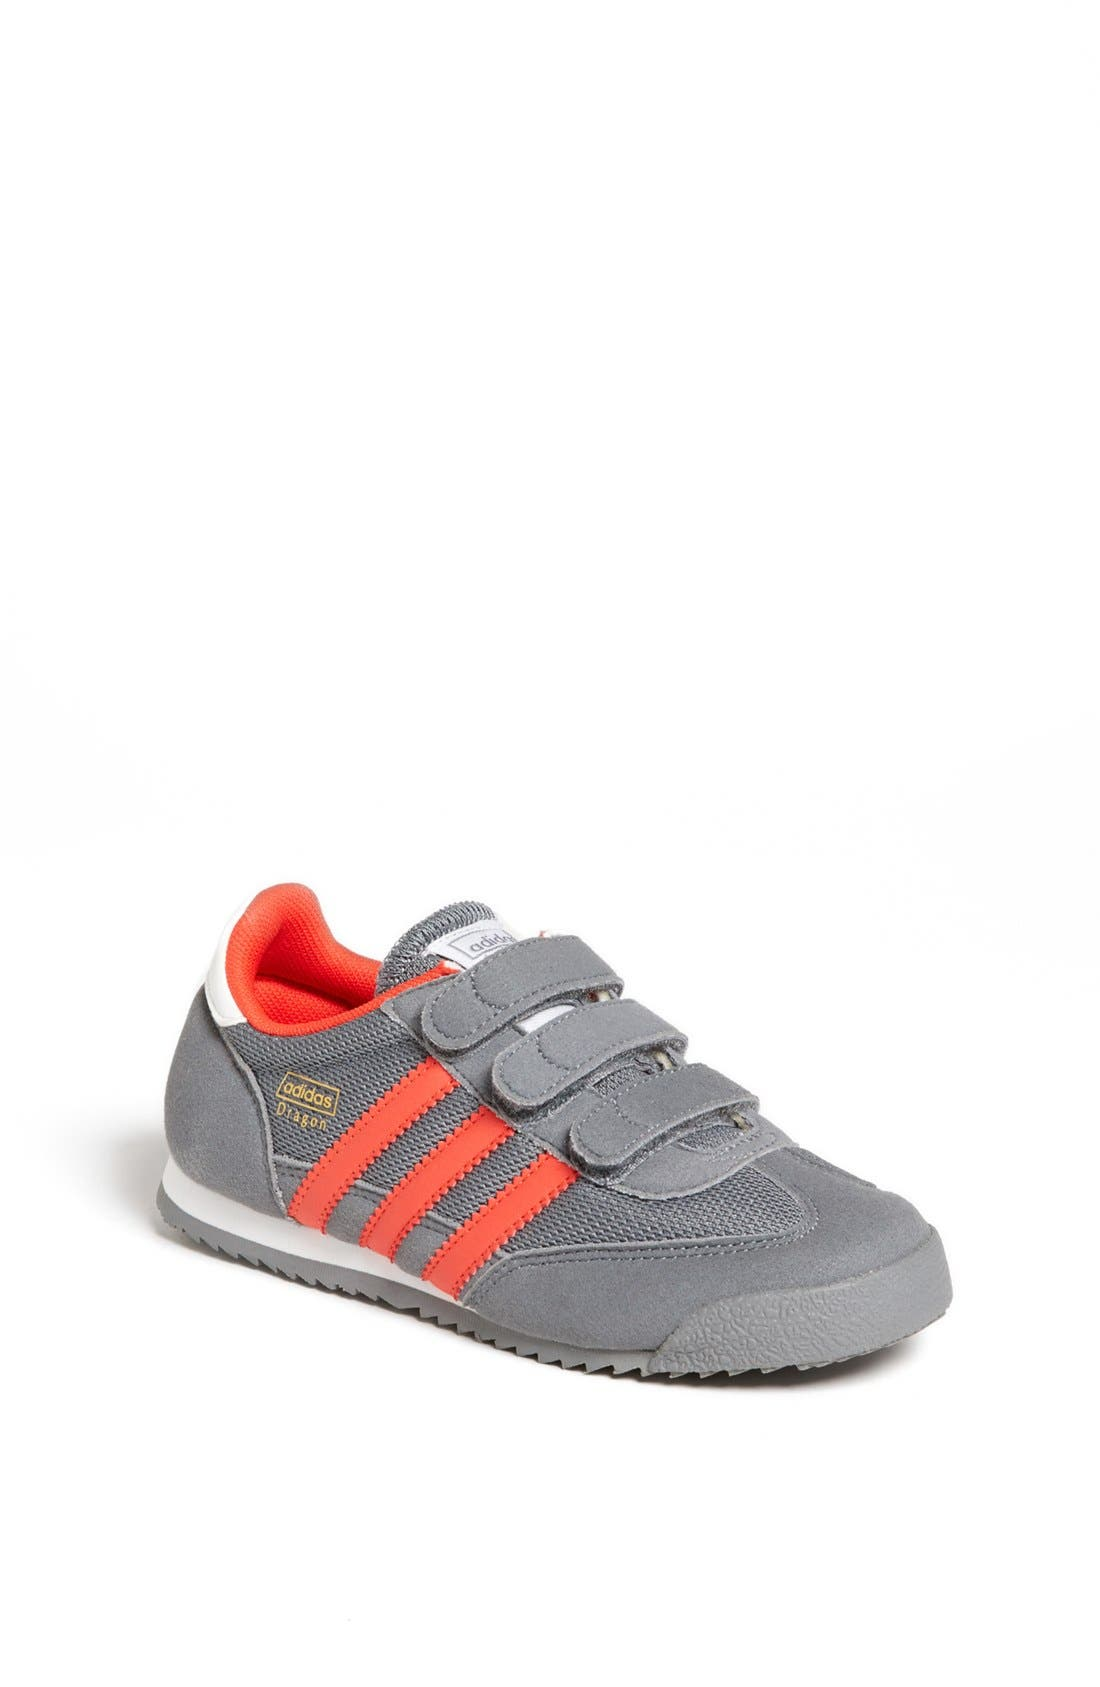 Alternate Image 1 Selected - adidas 'Dragon' Sneaker (Toddler & Little Kid)